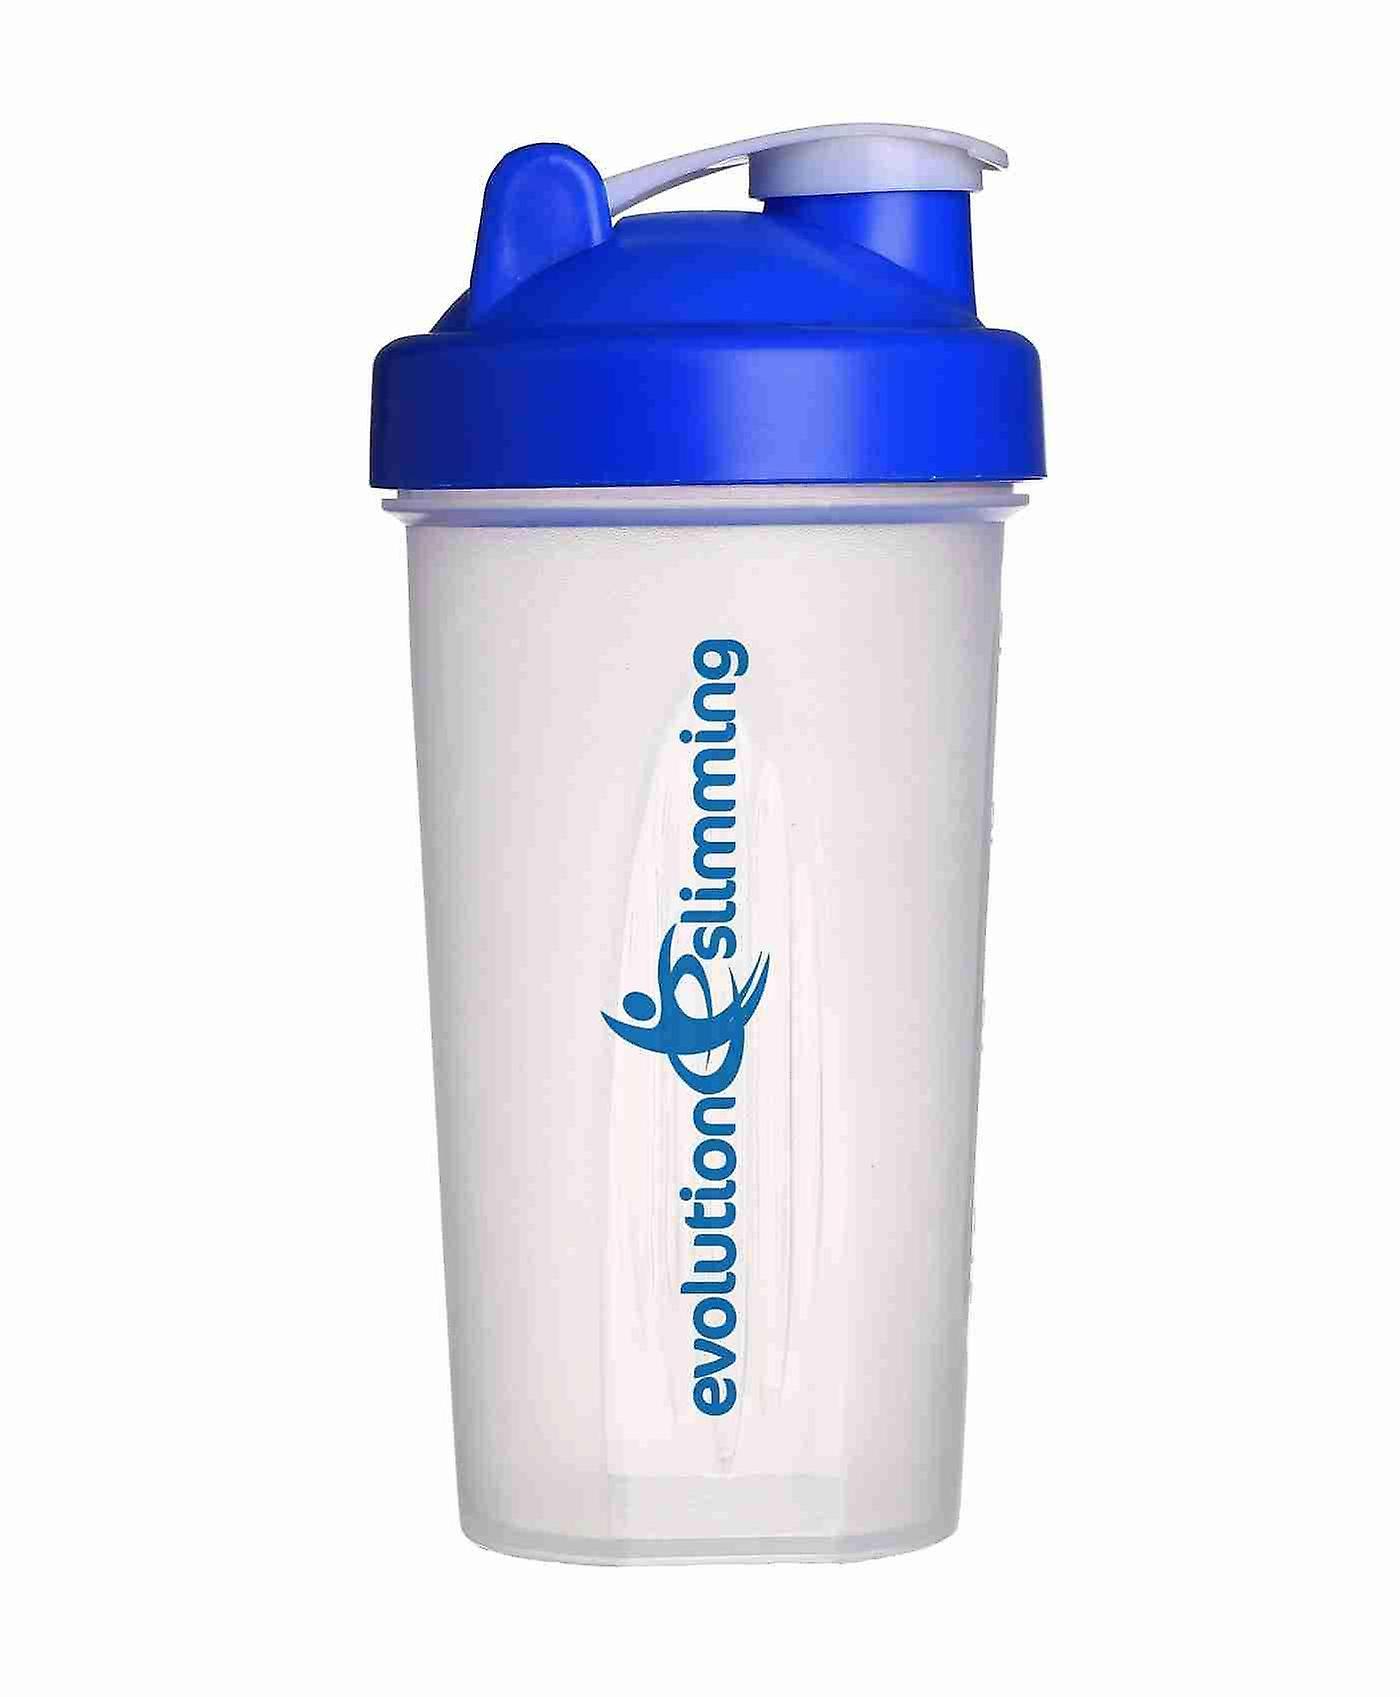 Evolution Slimming Large 700ml Protein Shaker - Blue/Clear - Protein Shaker - Evolution Slimming